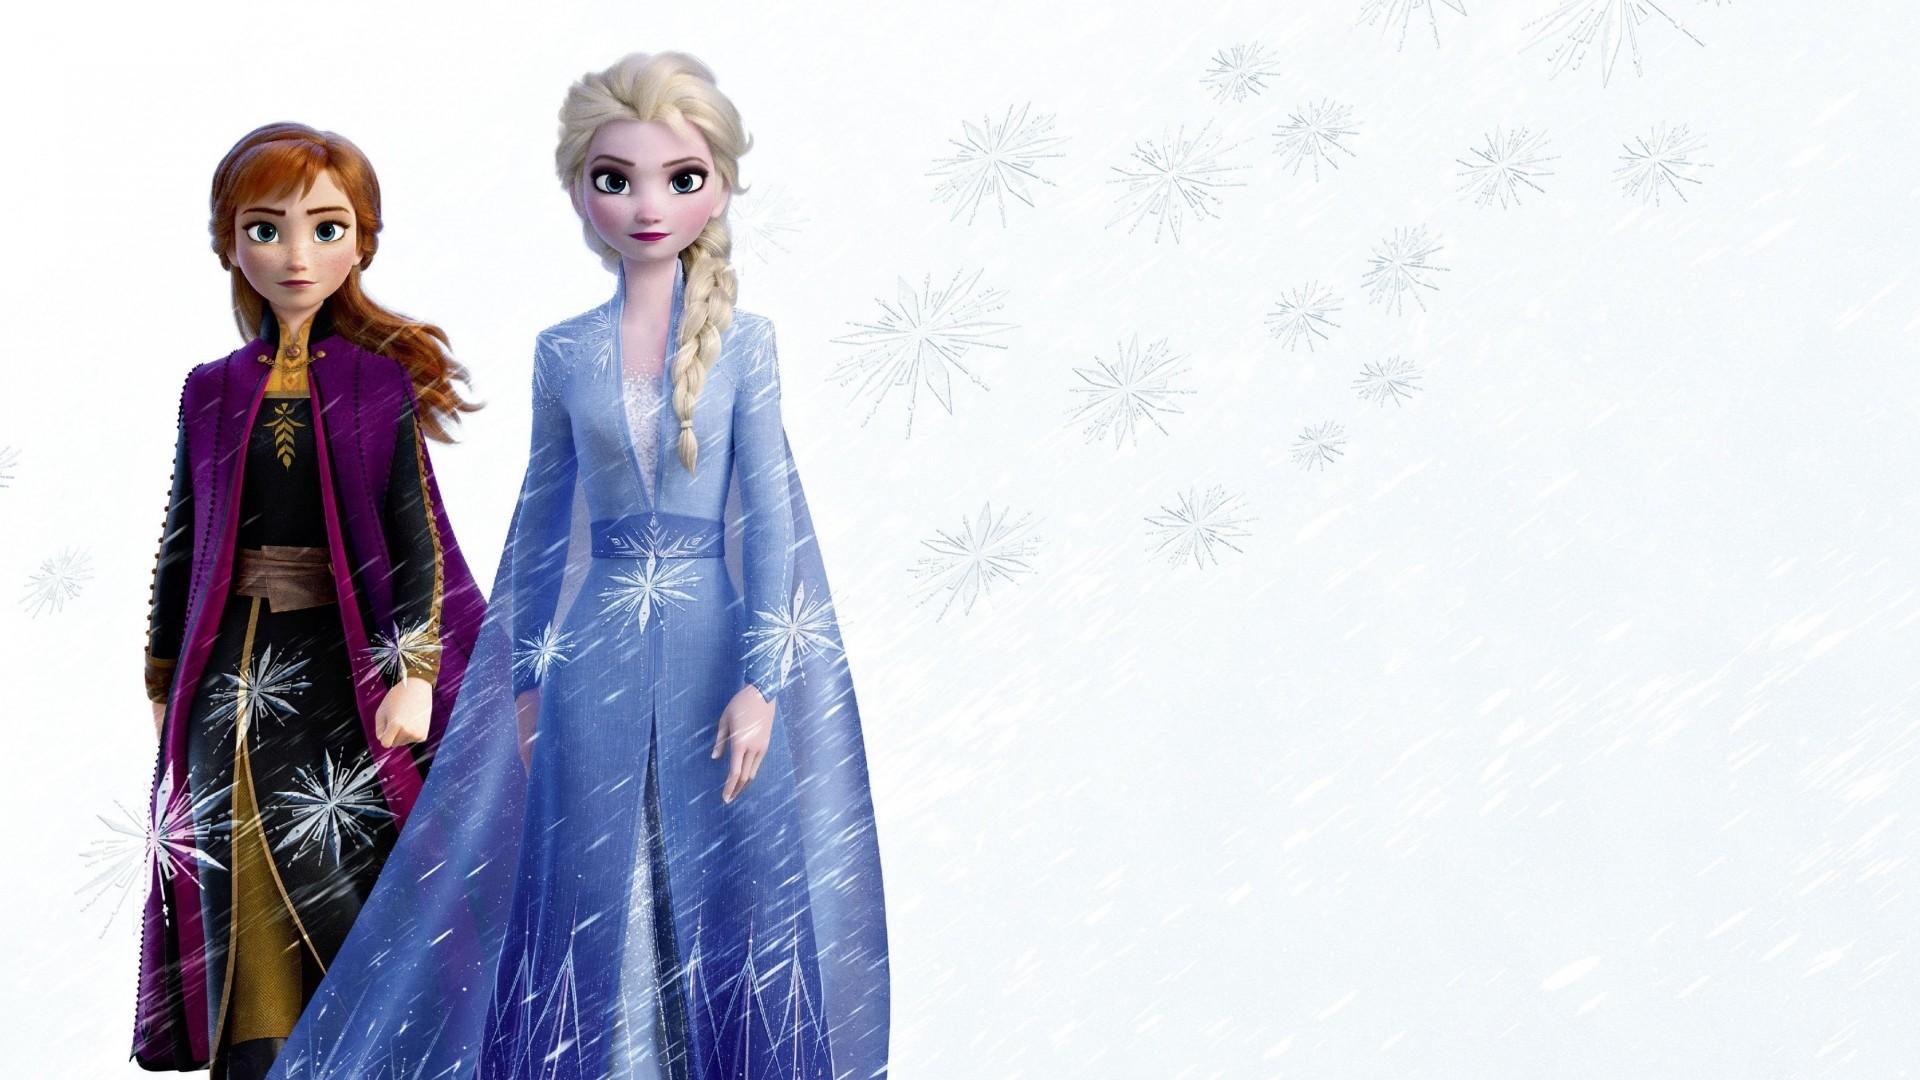 Frozen 2 Wallpaper Picture hd